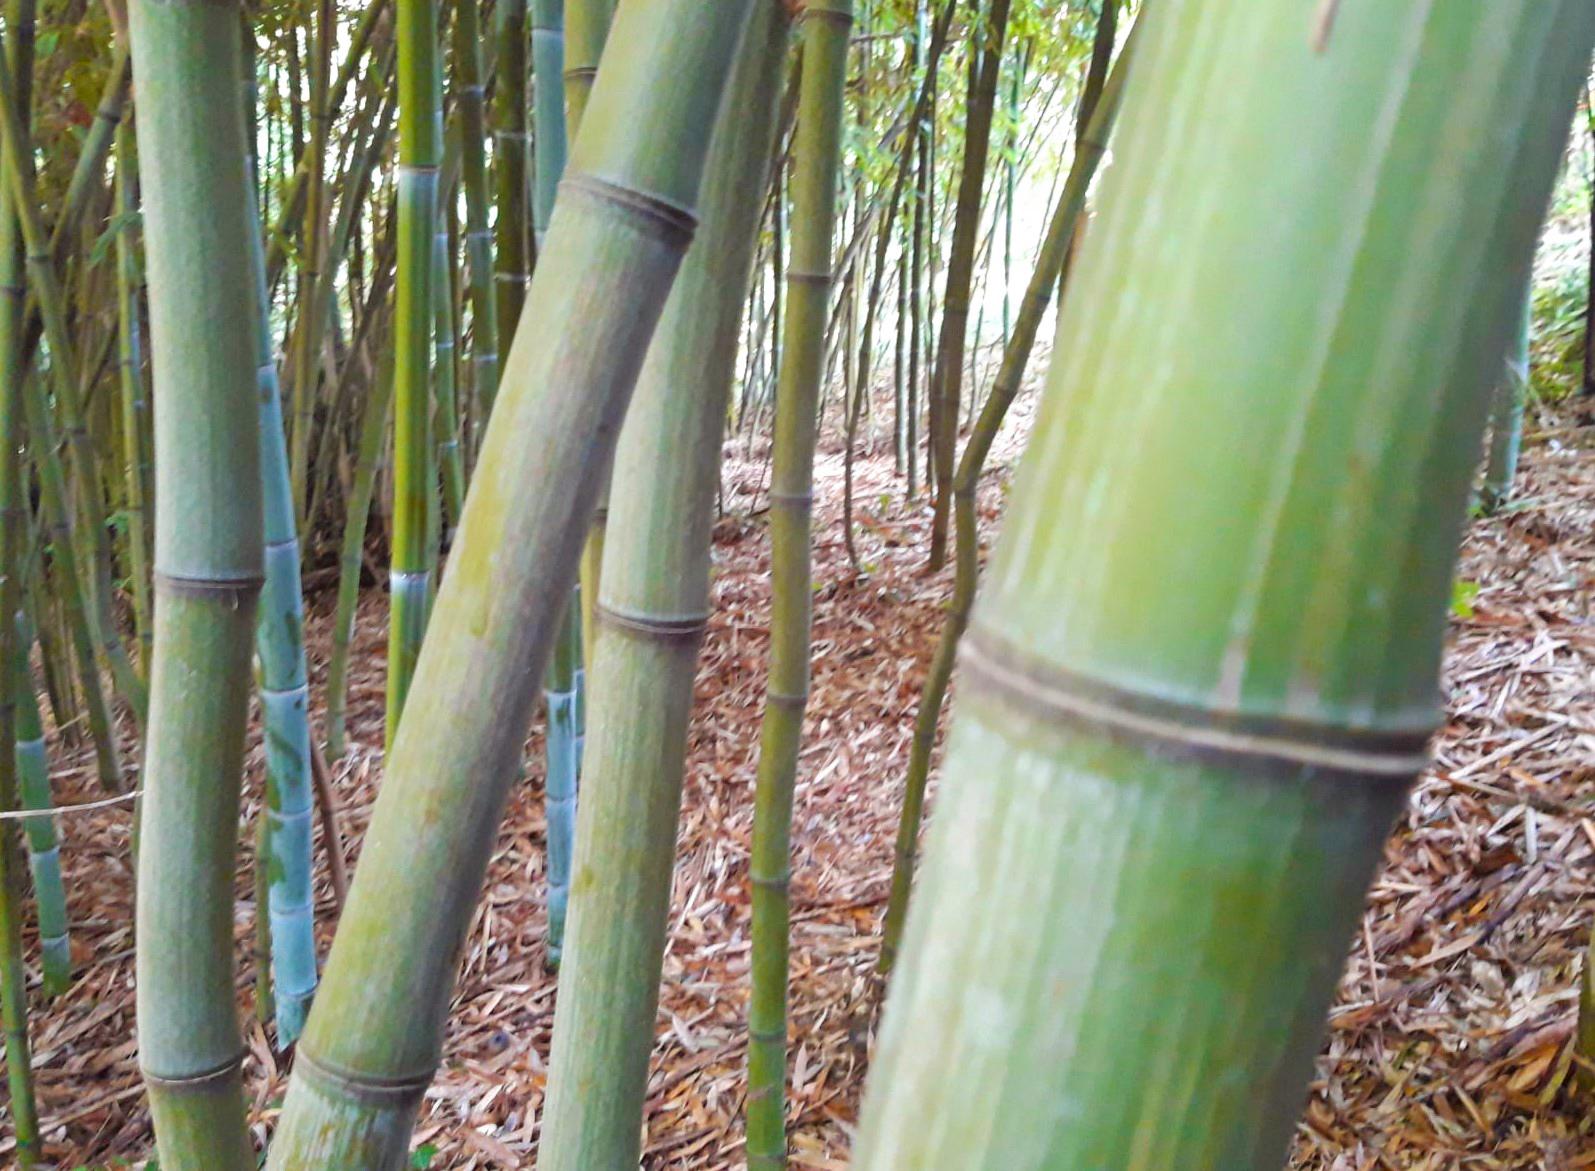 bambu pianta futuro nuova economia 1568274169